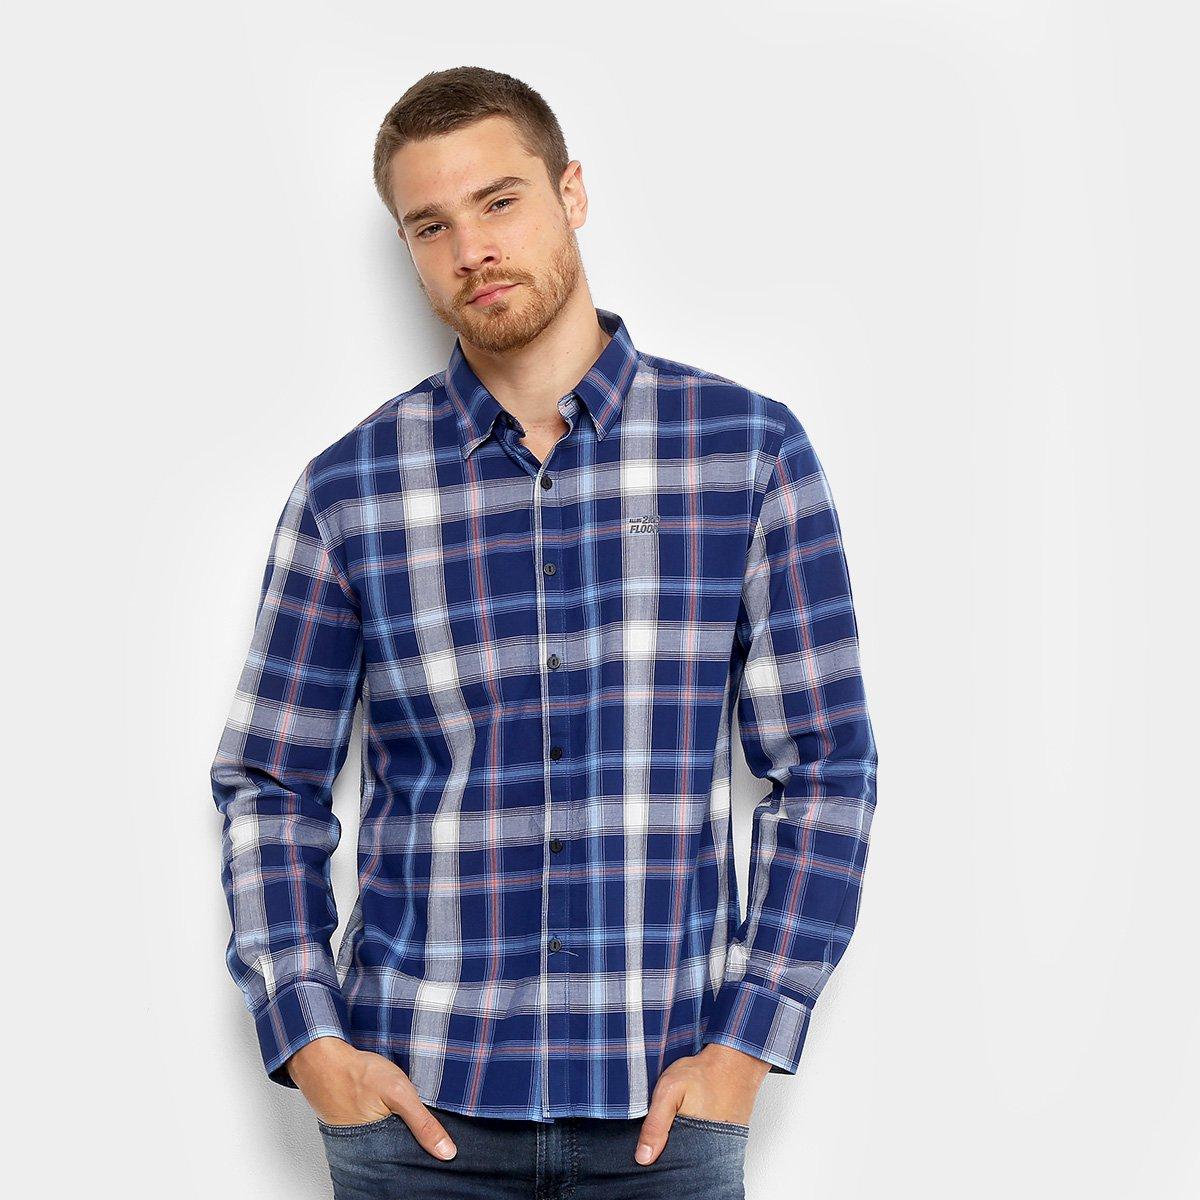 35ee811a418c4 Camisa Xadrez Ellus Manga Longa Masculina - Compre Agora